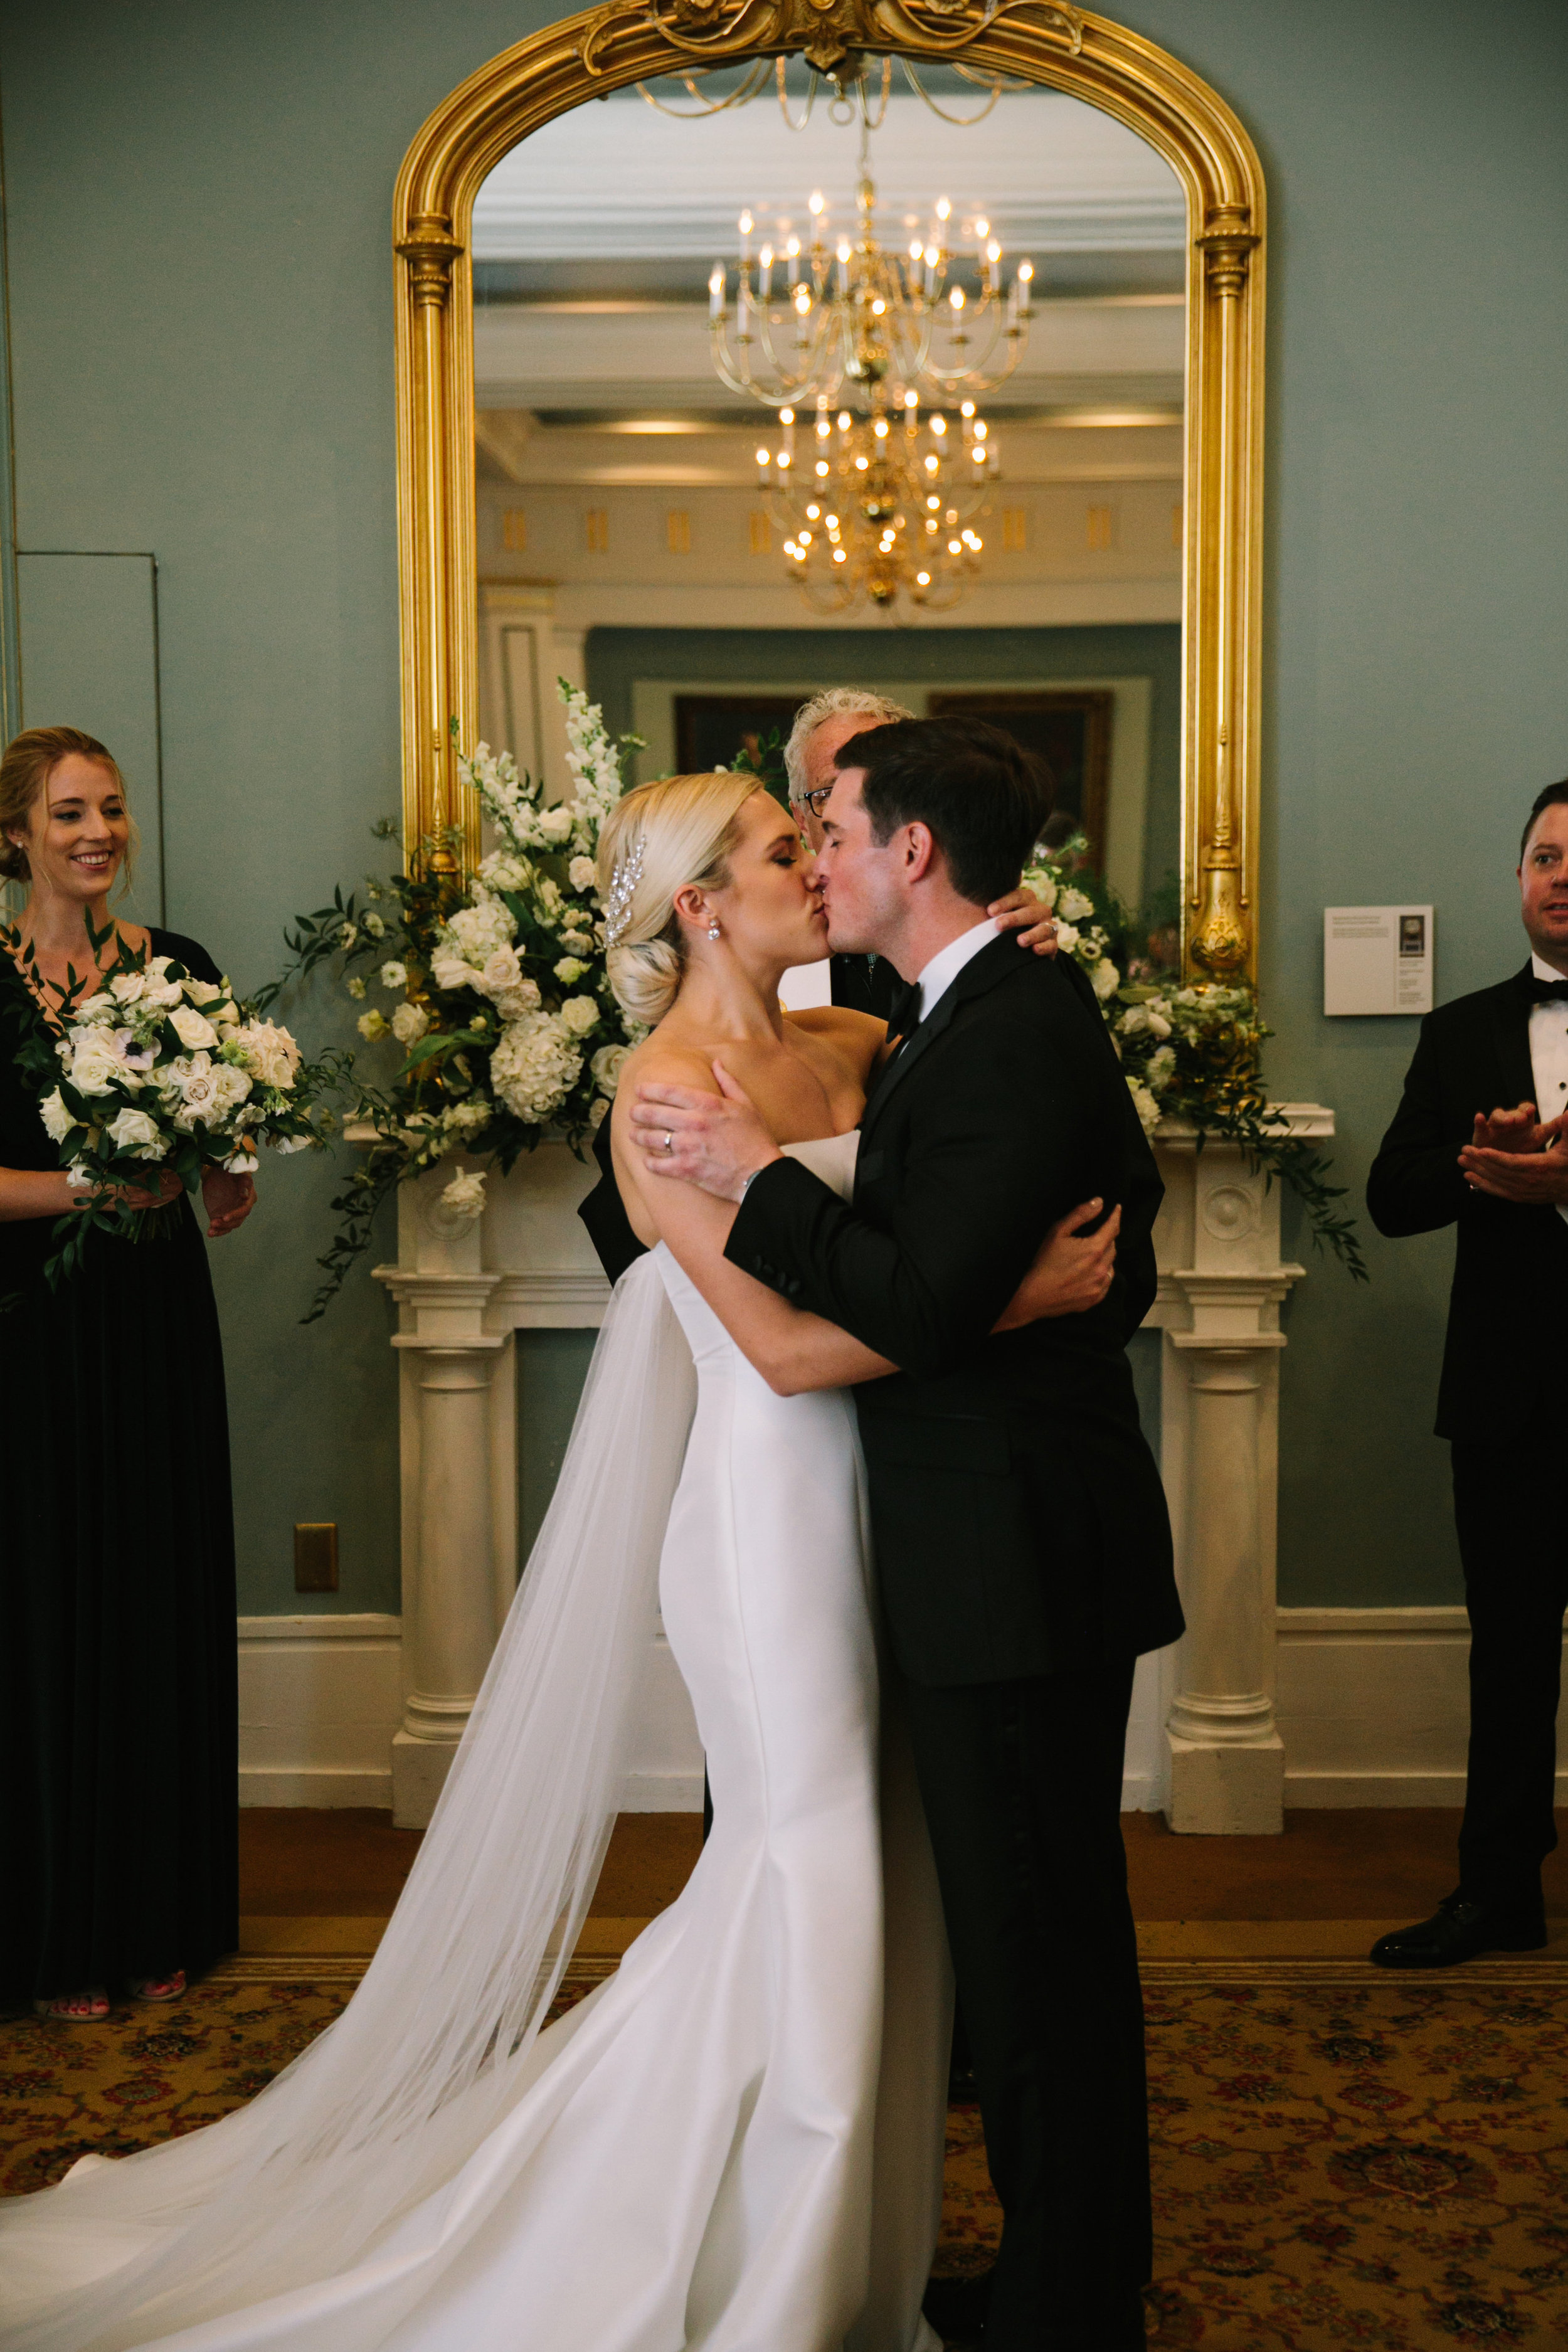 Finally Mr. & Mrs. -